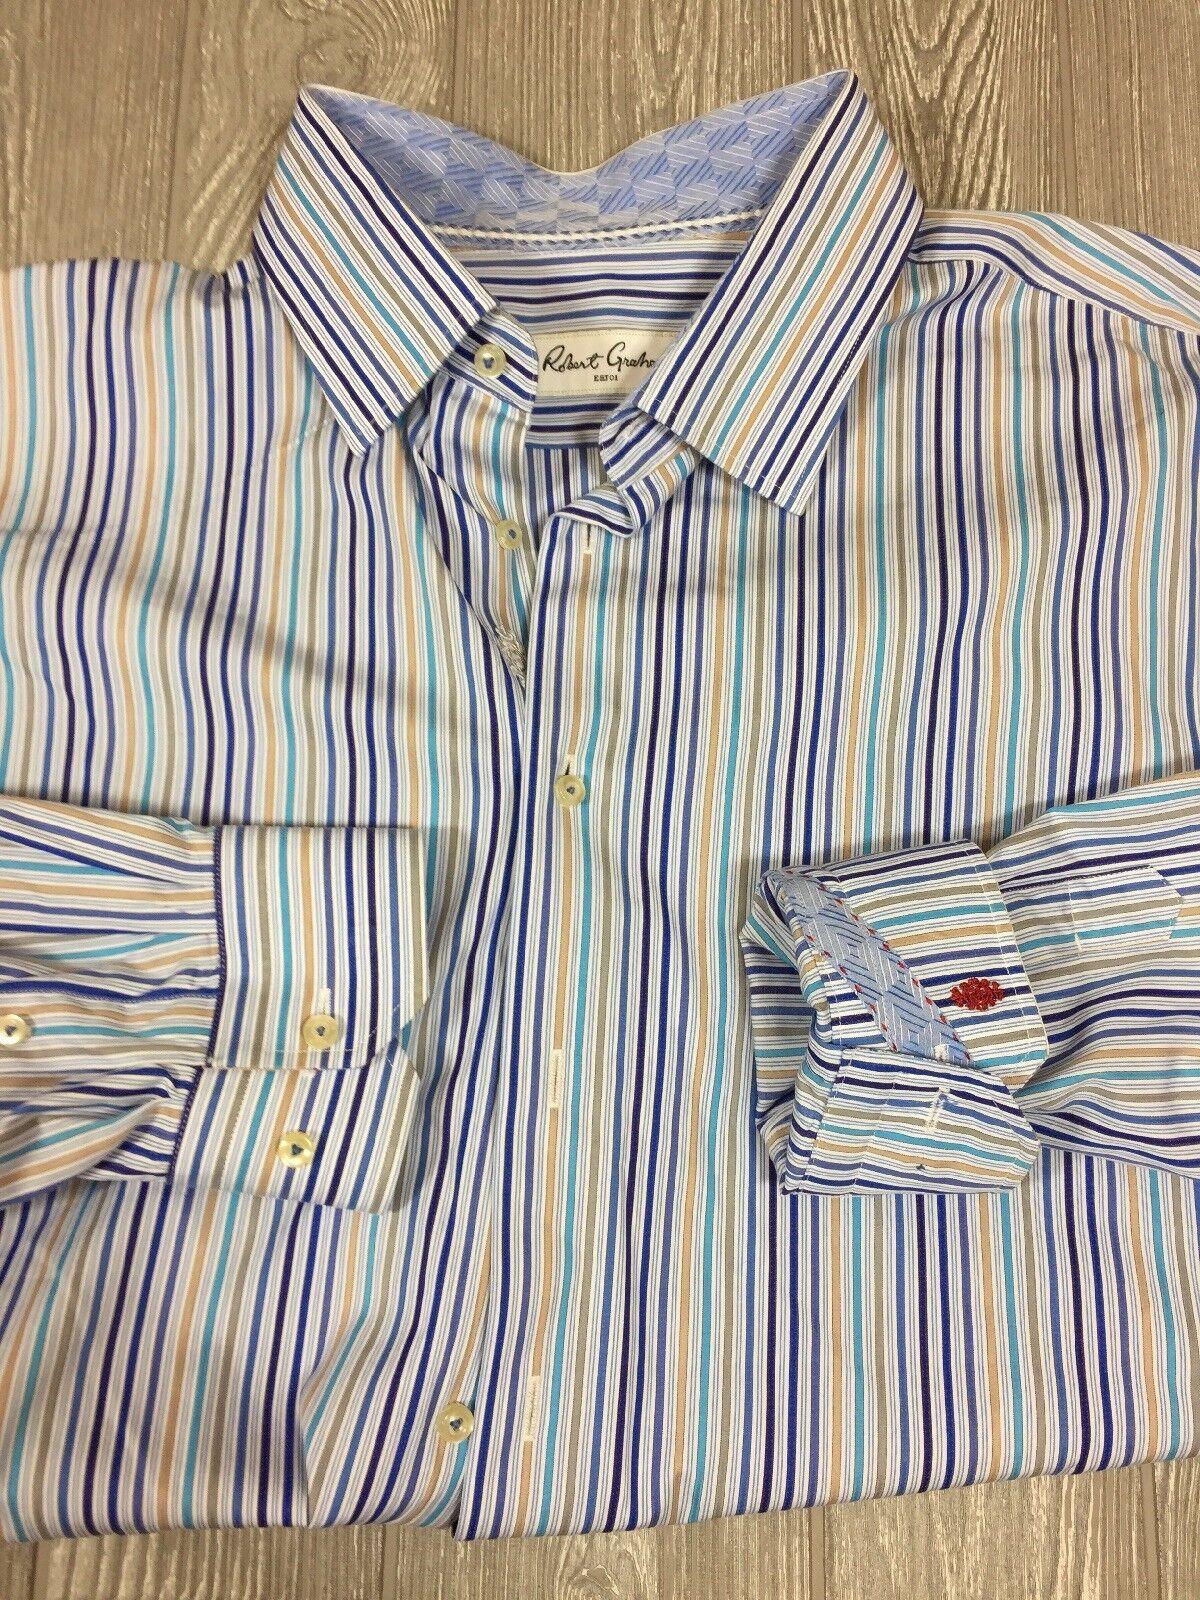 edaa311b37 Robert Graham Mens Multi color Button Casual Shirt Sz 18 46 34 35 ...